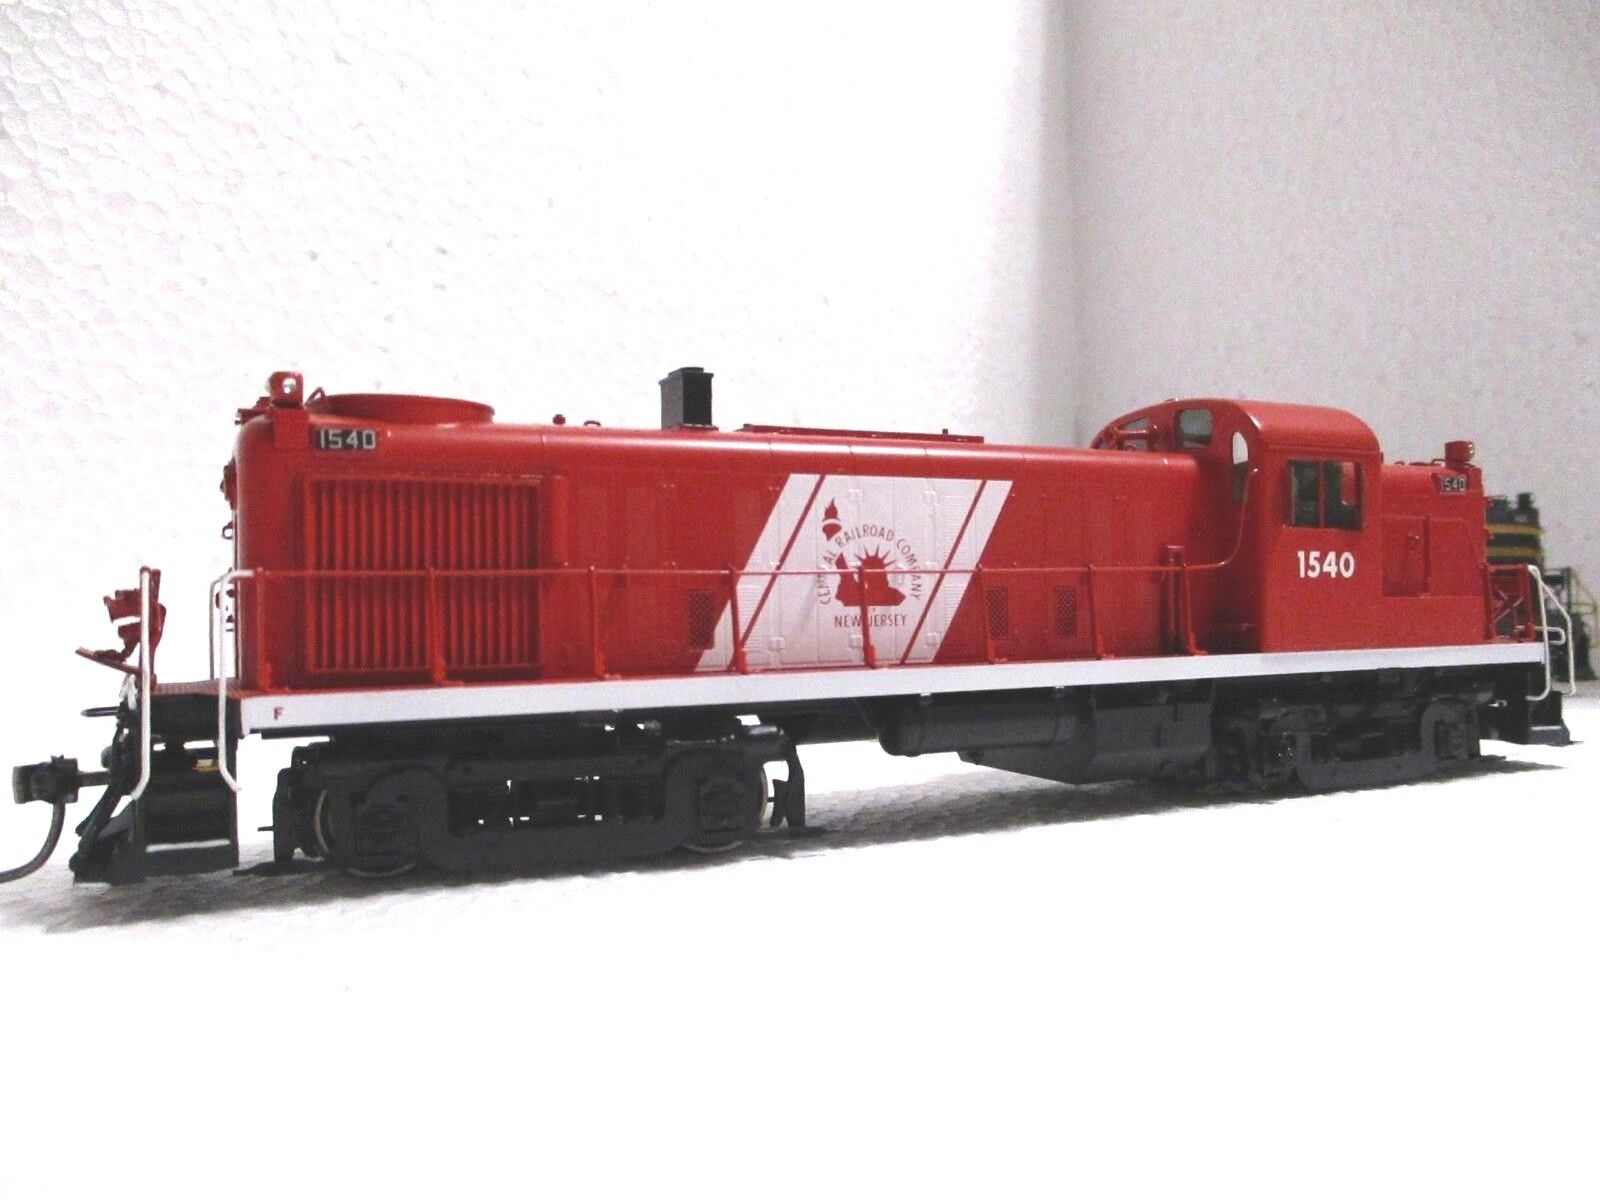 Abteilung punkt messing - skala - central railroad - new jersey alko - erfolge   1540